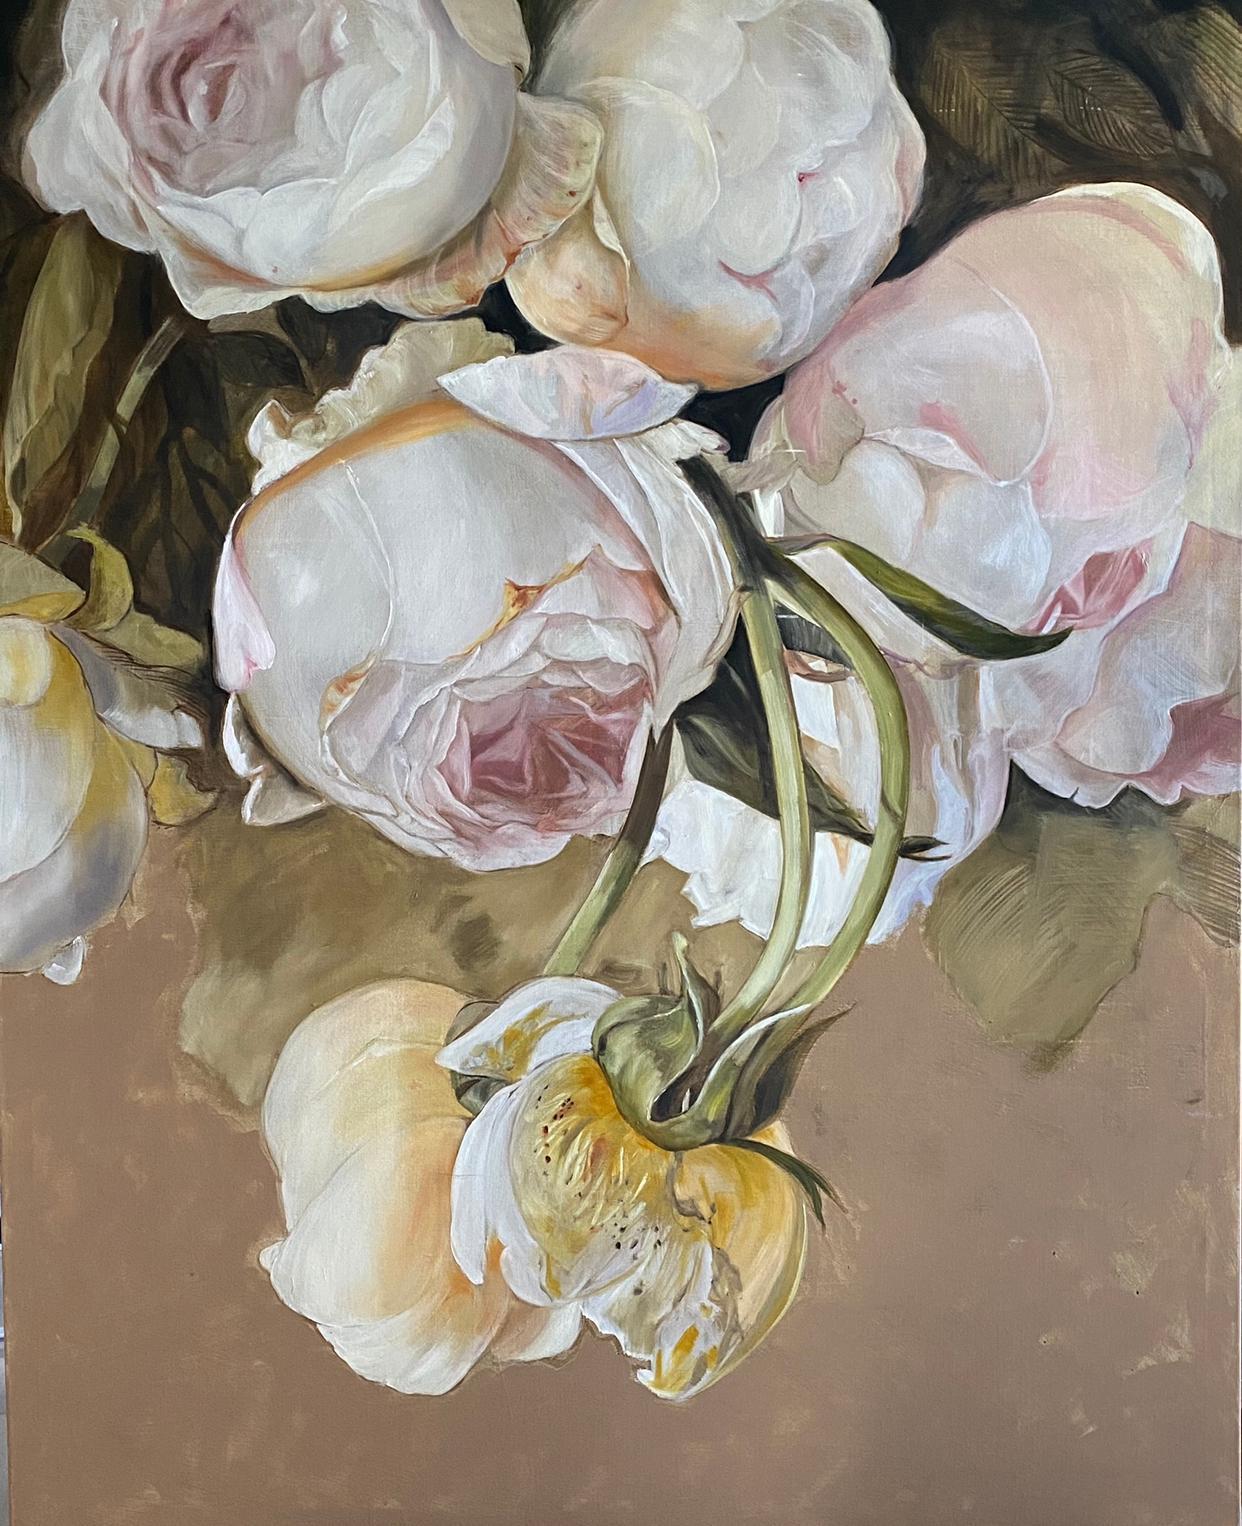 'Simonetta', 2020, Contemporary still life on oil on canvas